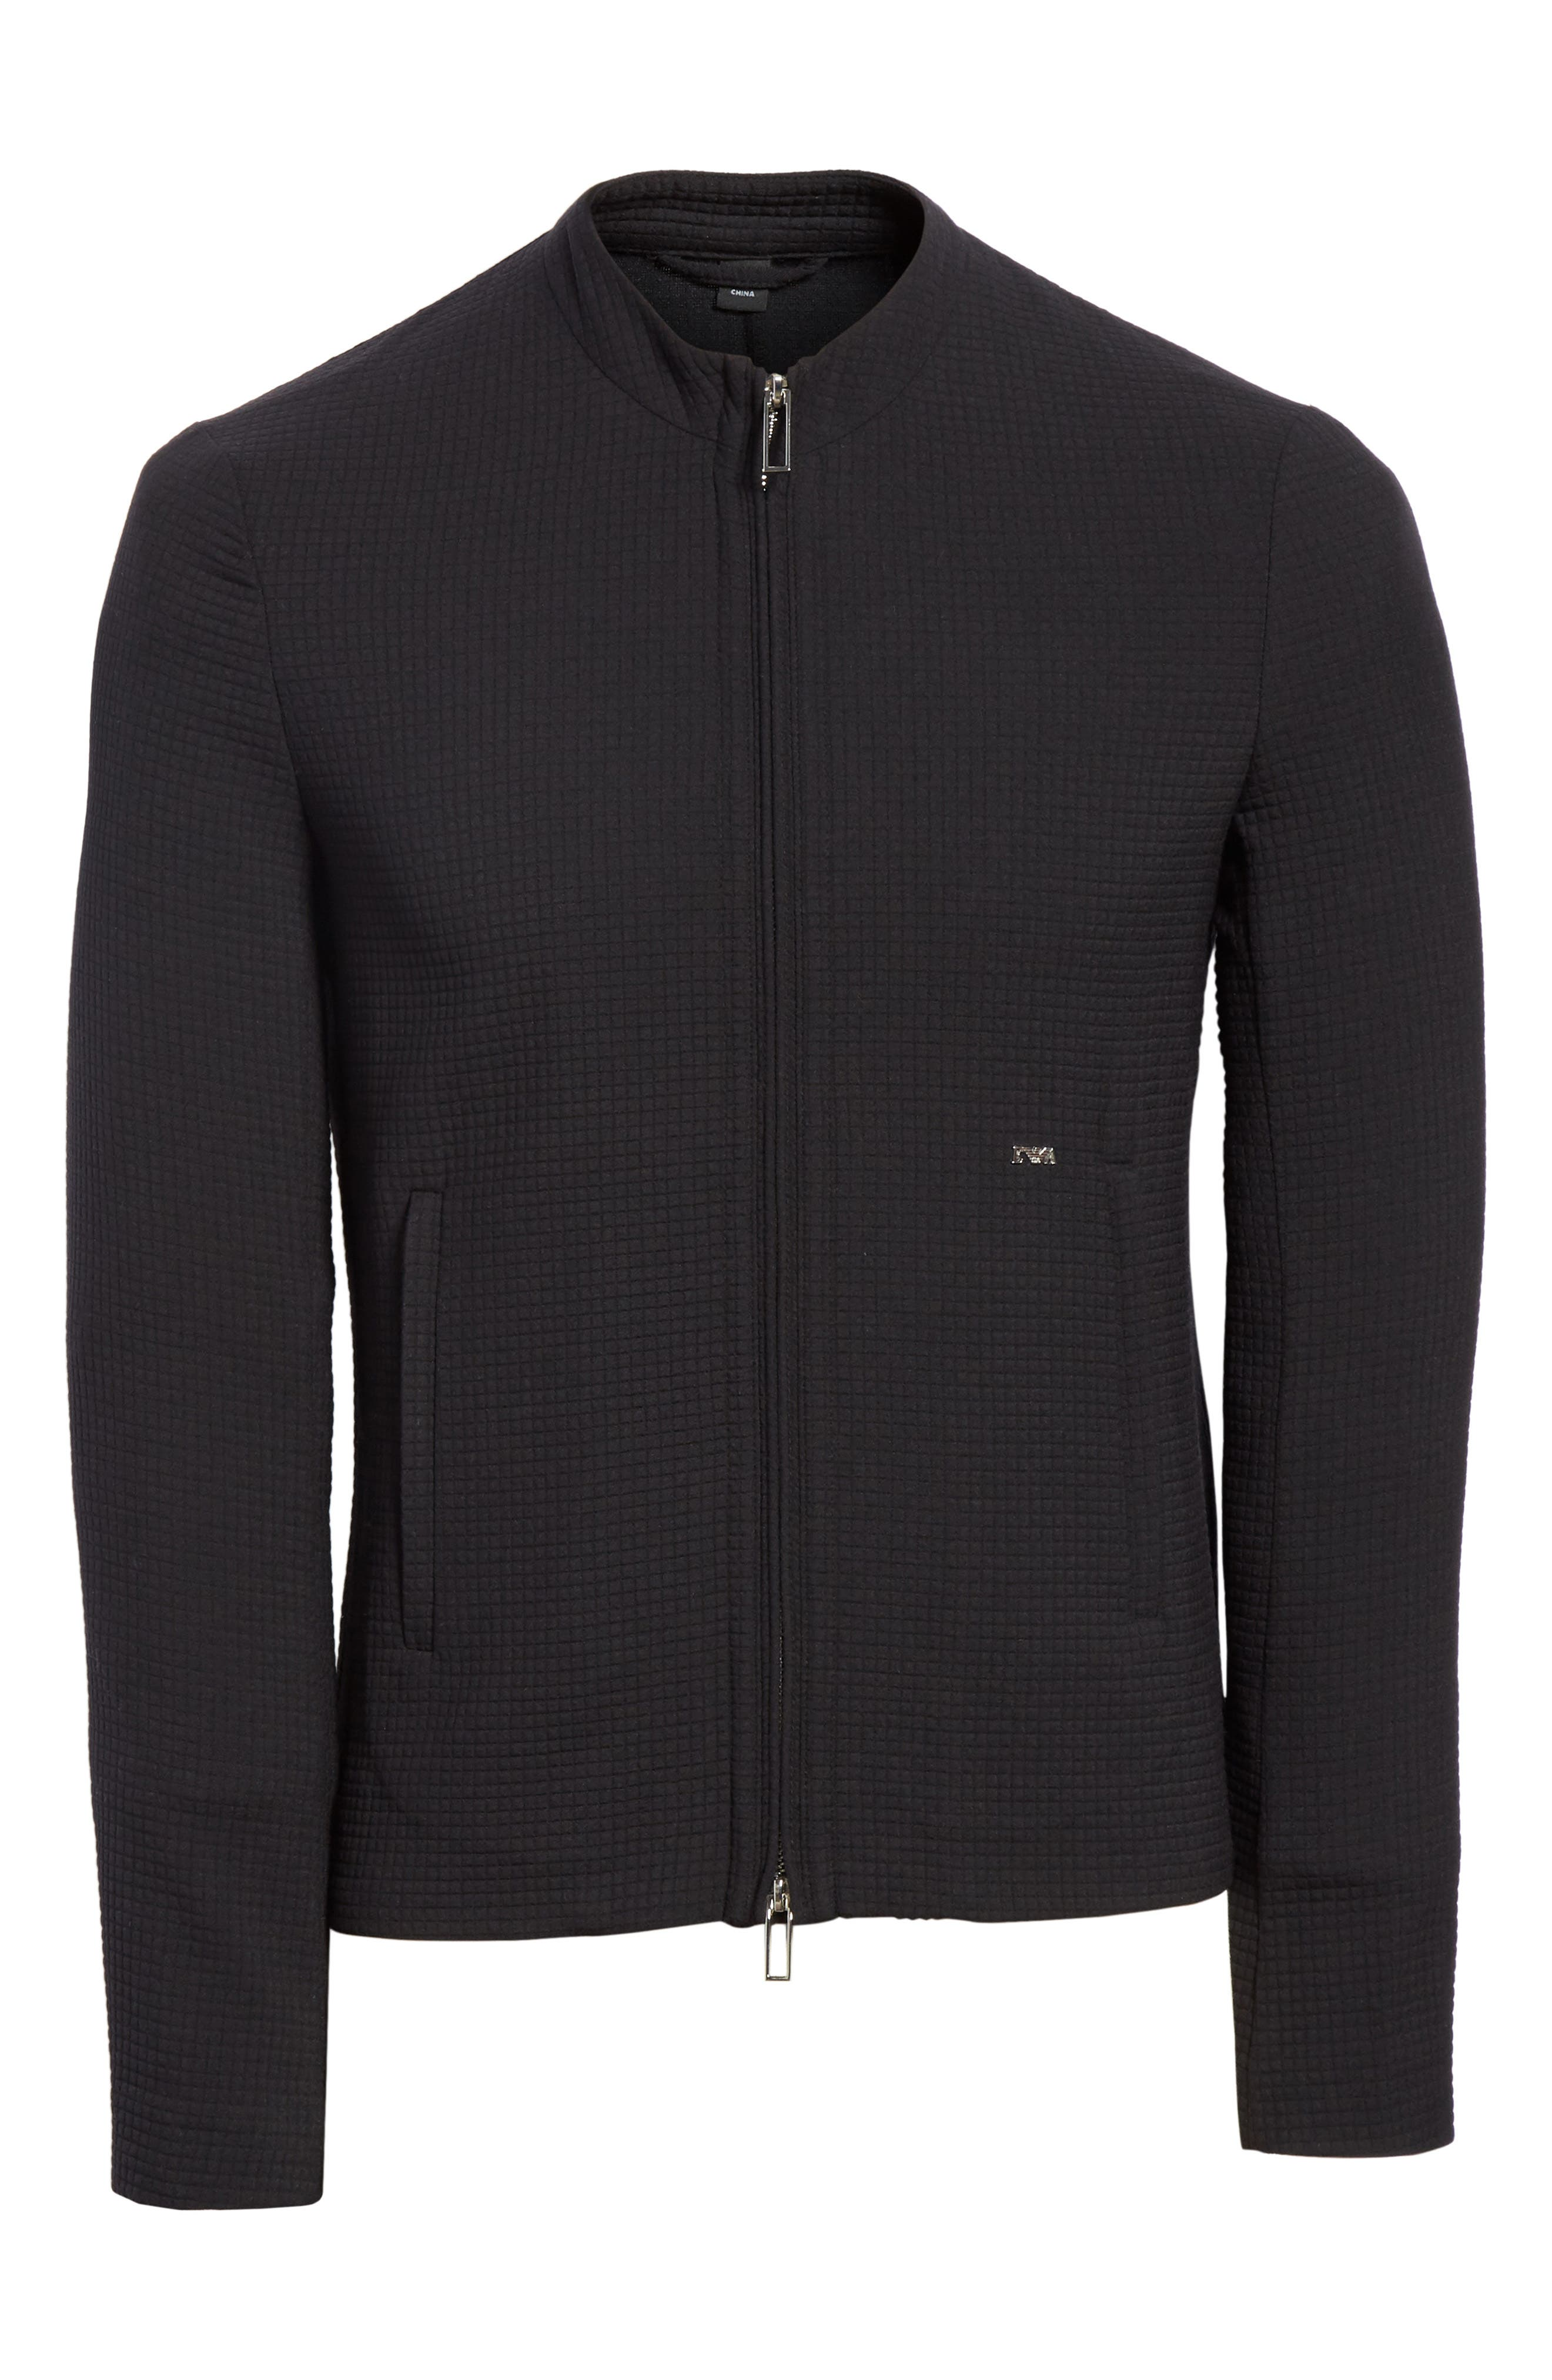 Ripstop Check Wool Blend Jacket,                             Alternate thumbnail 6, color,                             001